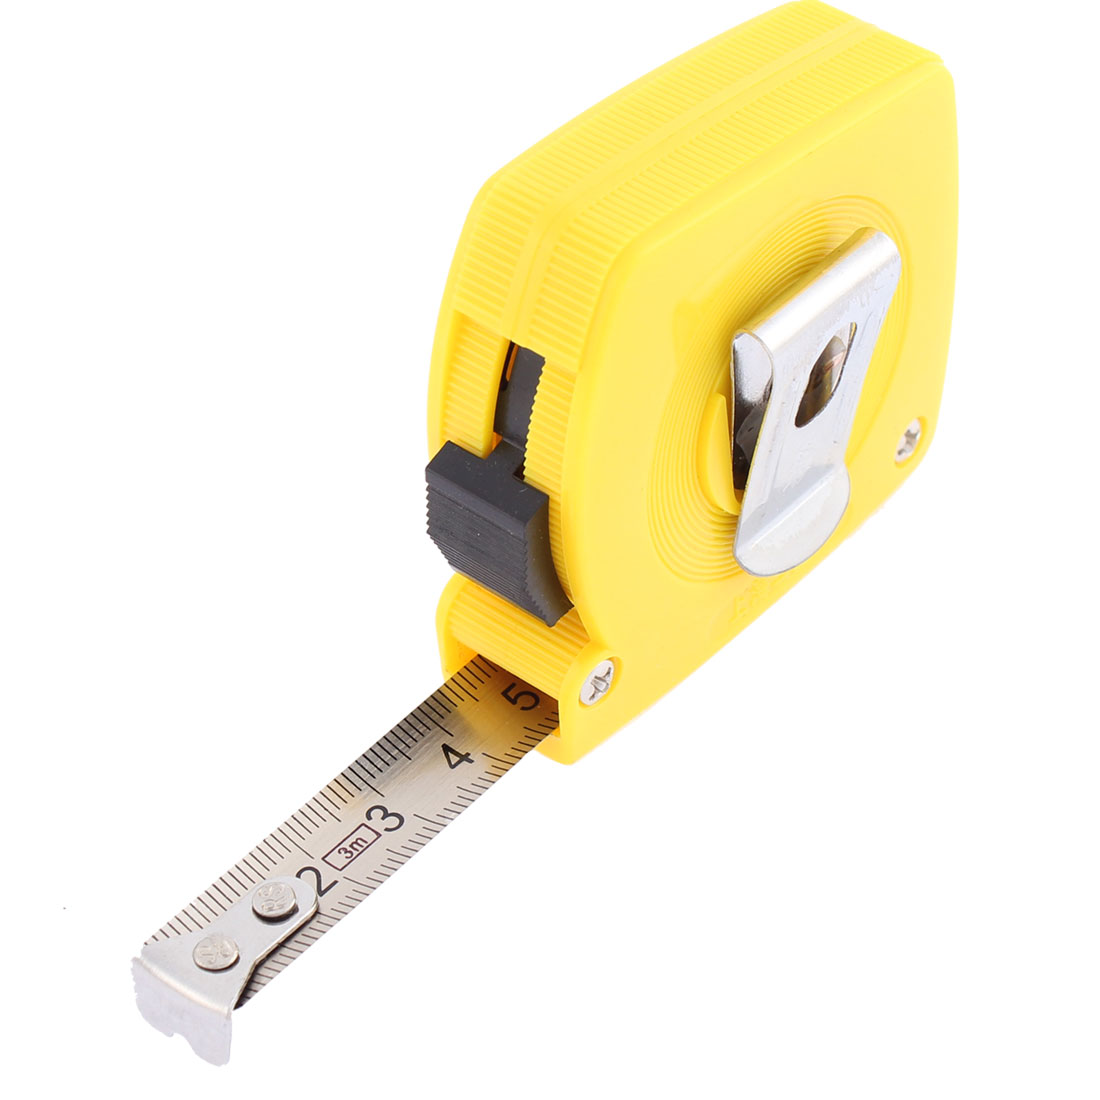 3 Meter 9.8Ft Long 12mm Width Retractable Metric Steel Tape Ruler Measure Tool